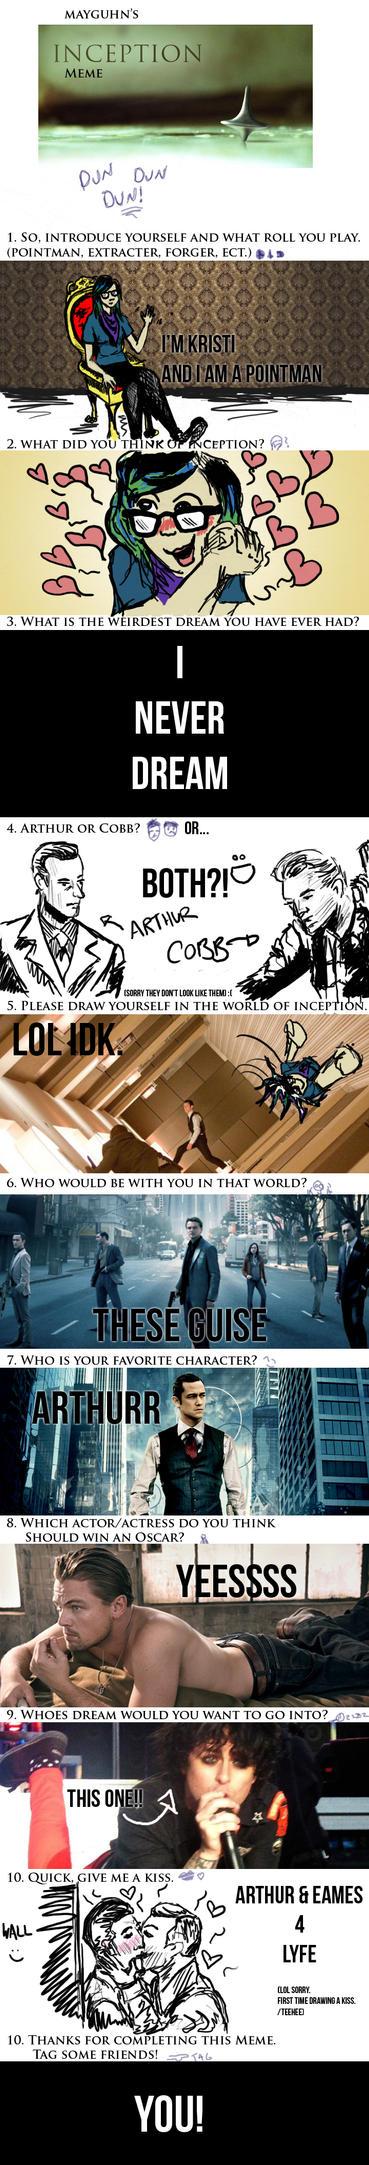 Inception Meme by swollenabattoir